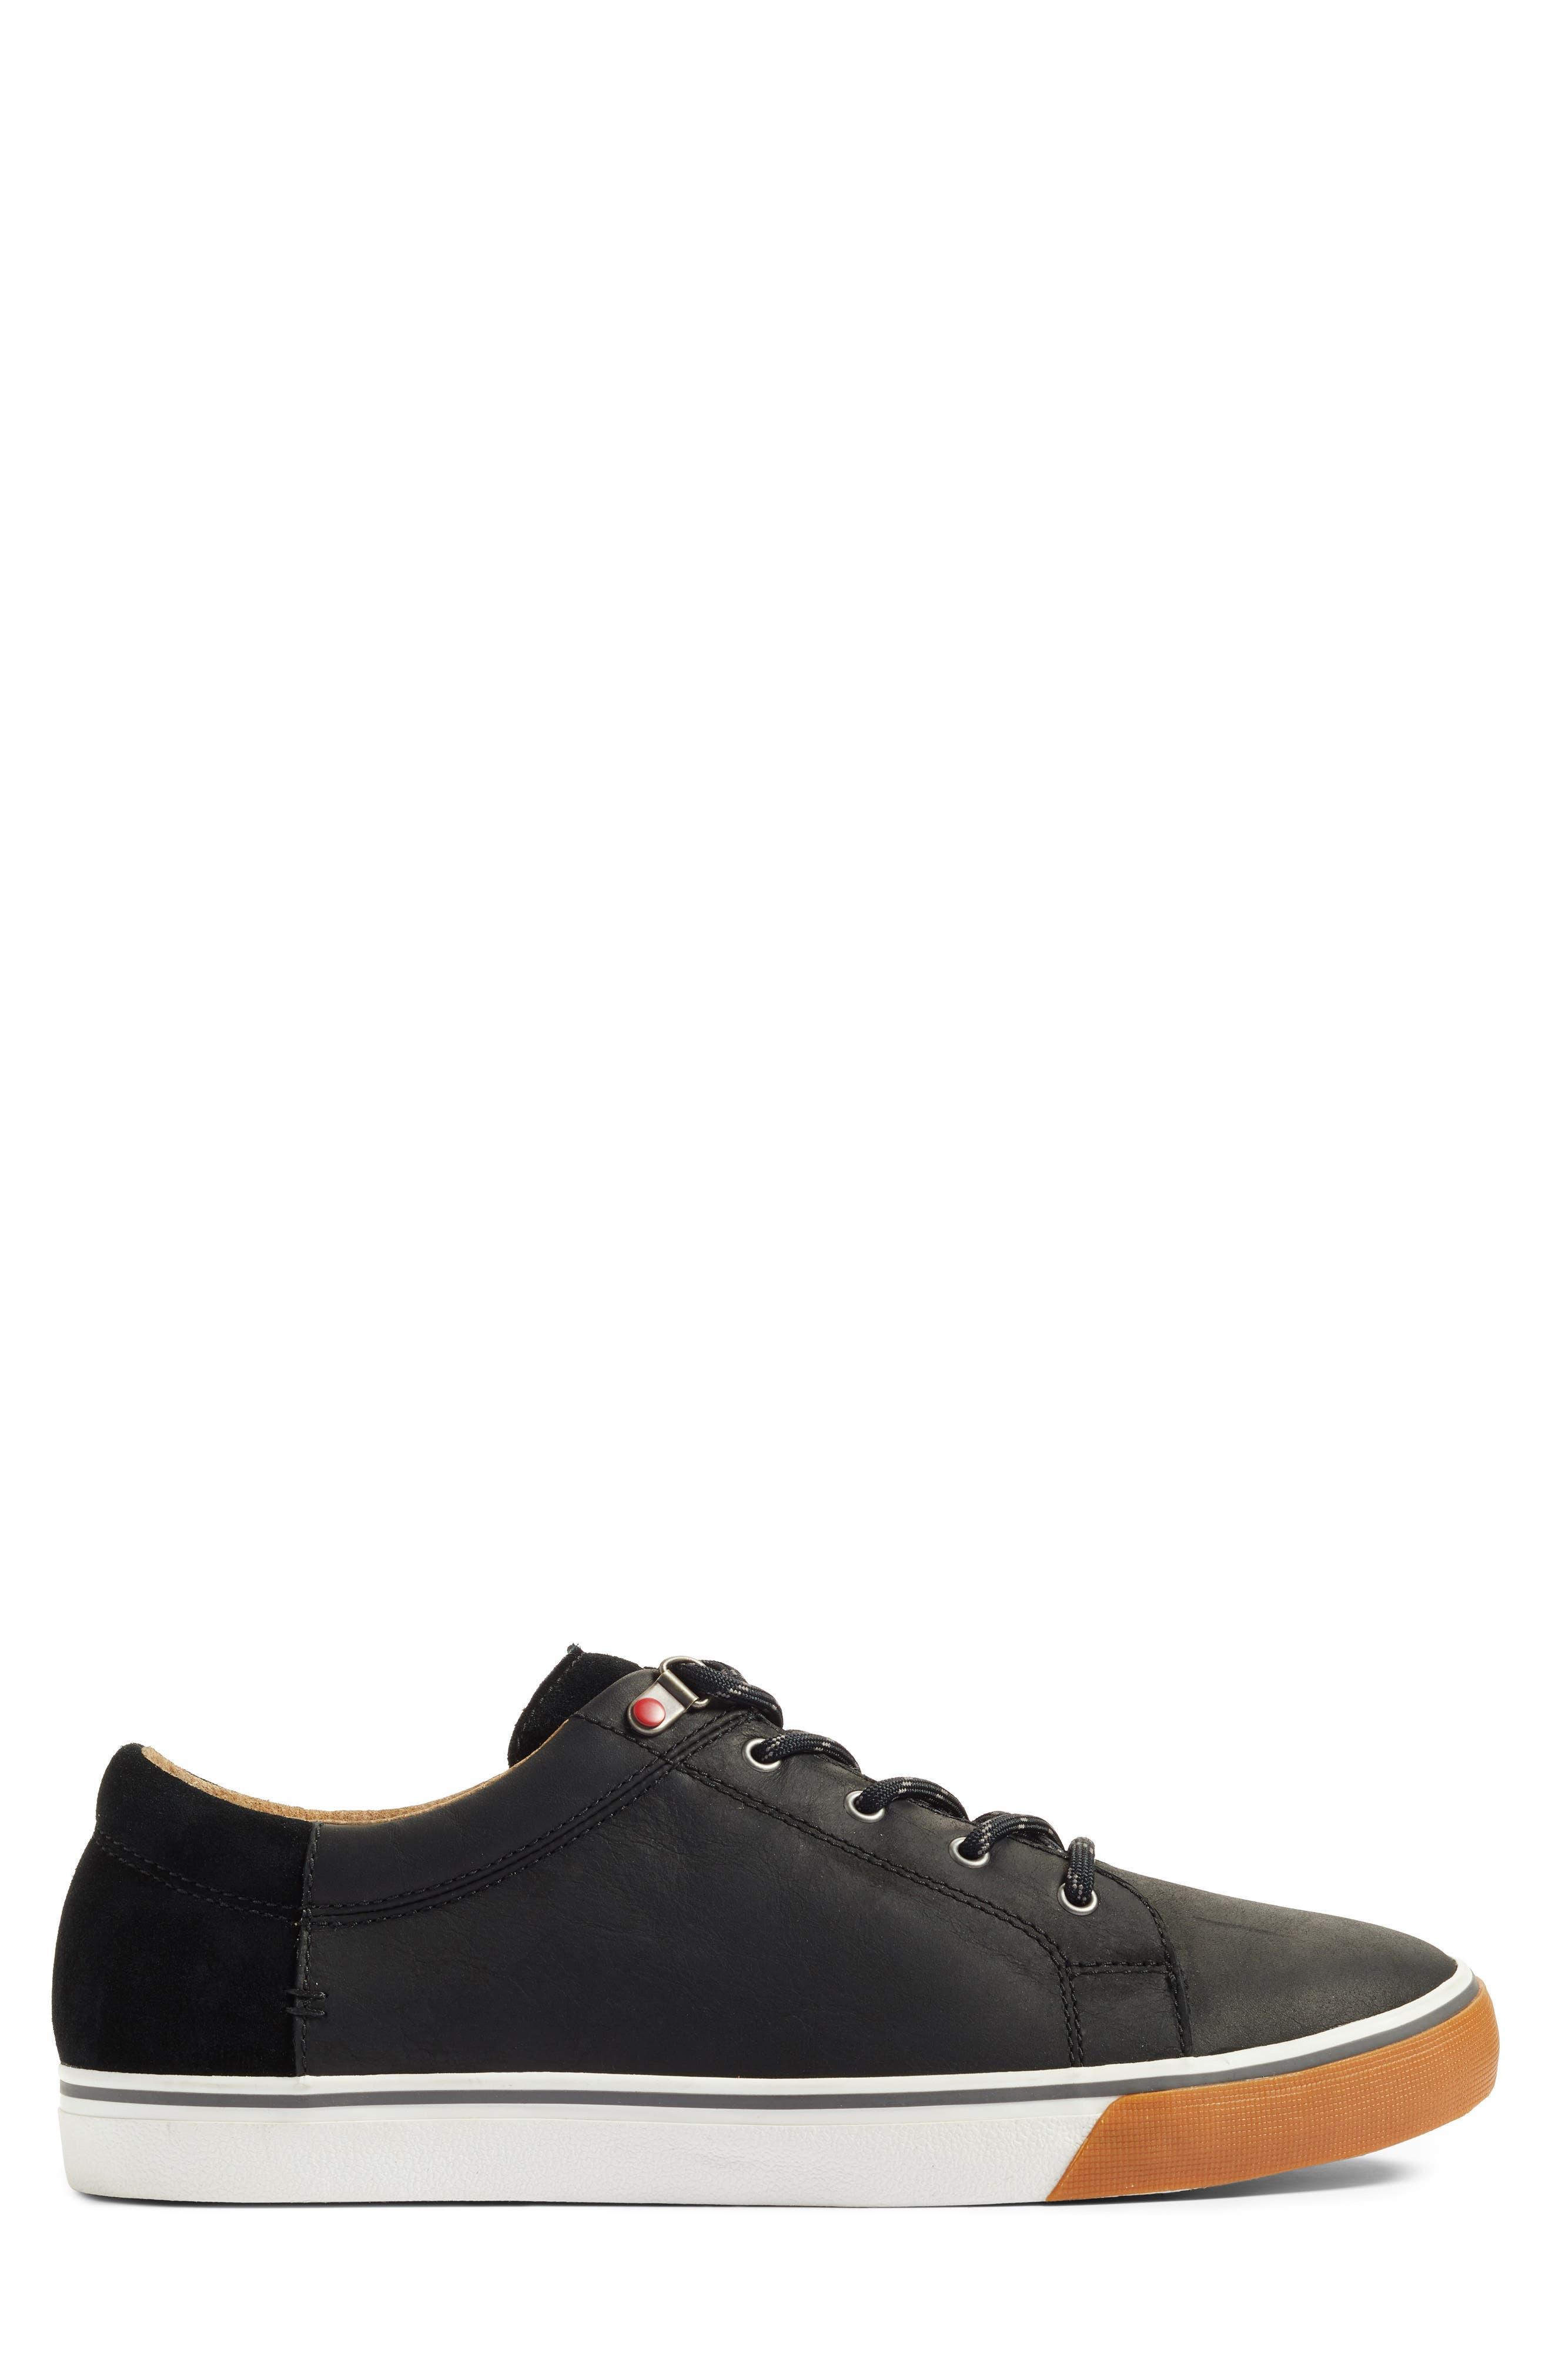 Brock Sneaker,                             Alternate thumbnail 3, color,                             Black